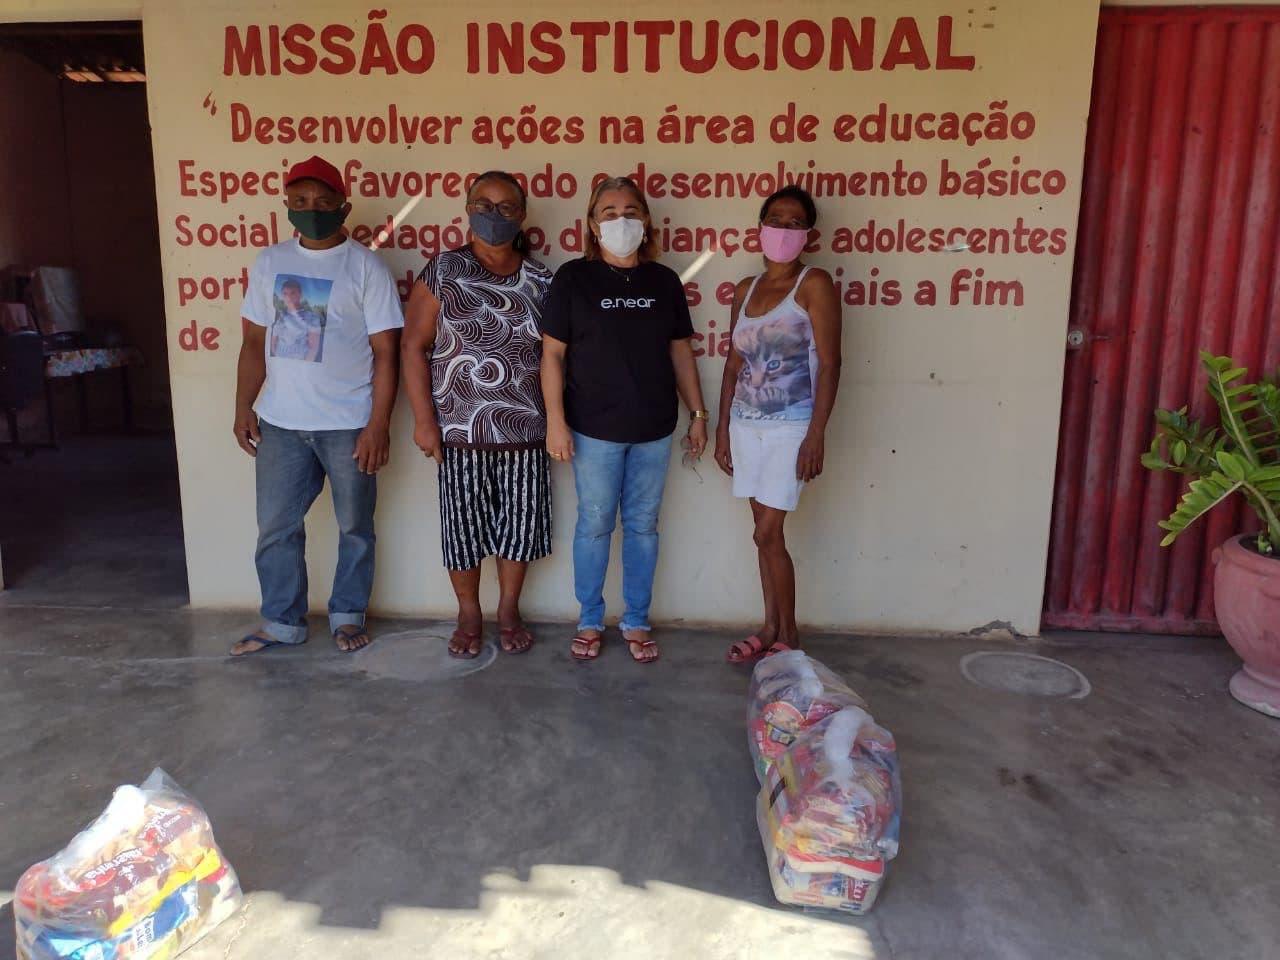 e.near - food baskets offer - Pestalozzi Association Milagres (7)